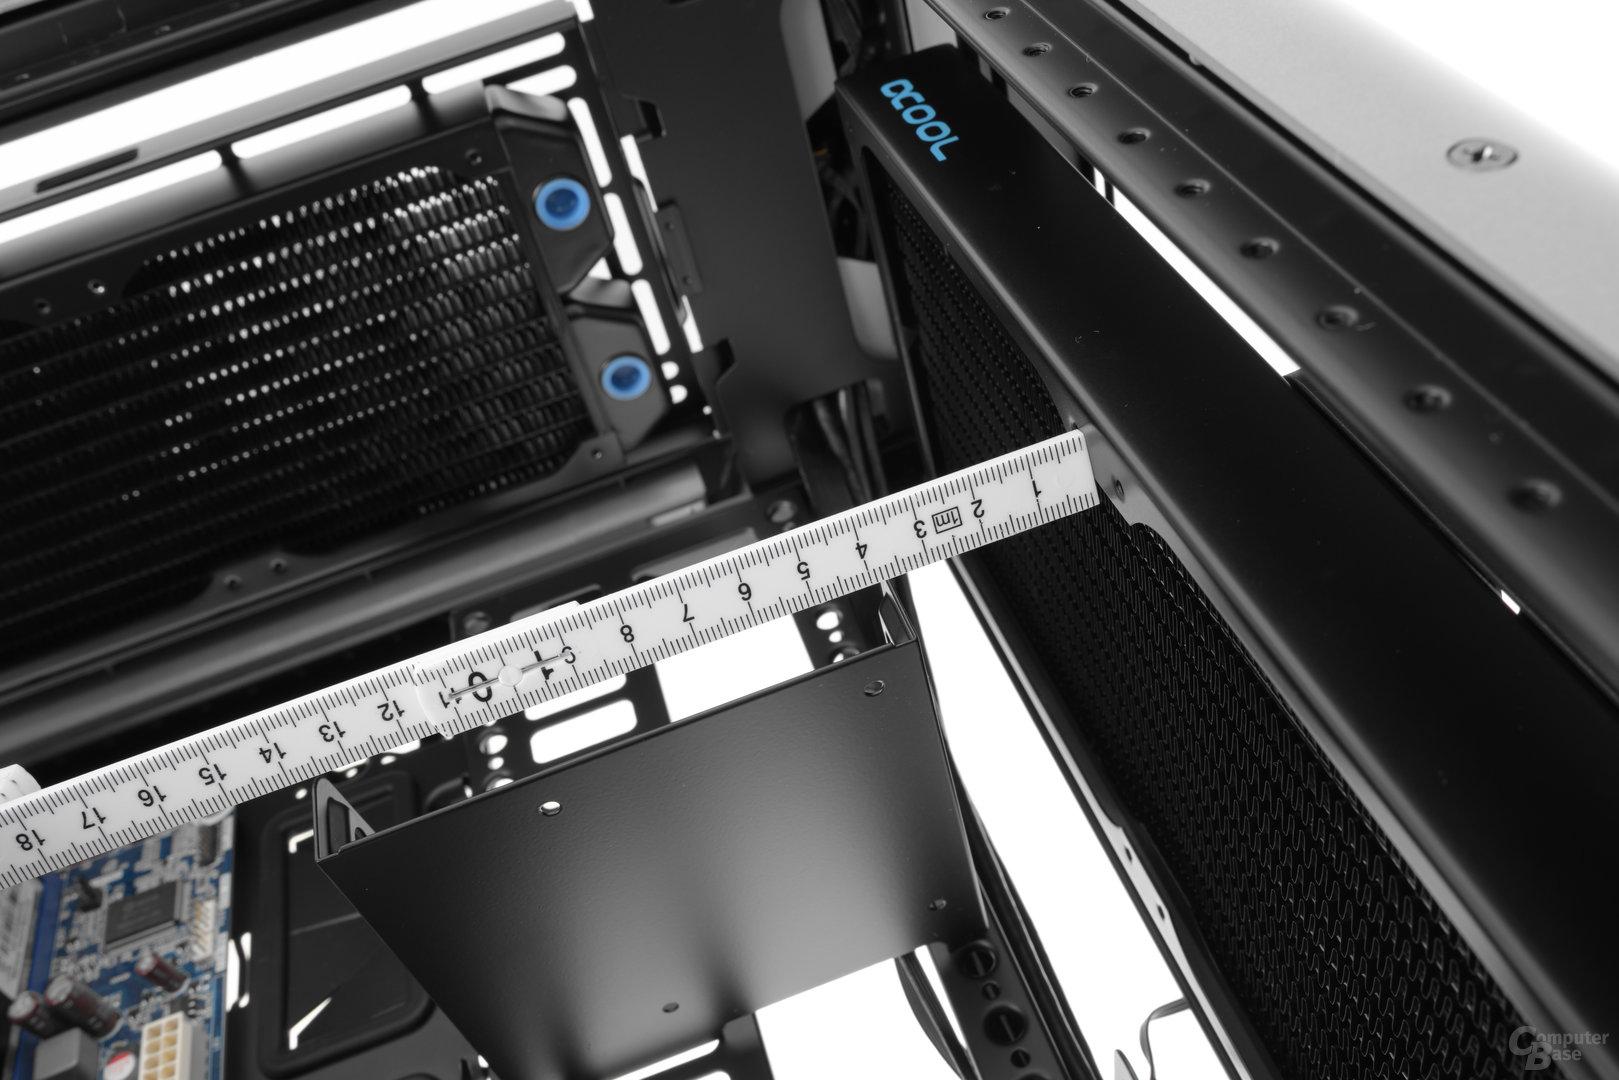 Cooler Master Cosmos C700P – Der Frontradiator darf ruhig dicker ausfallen